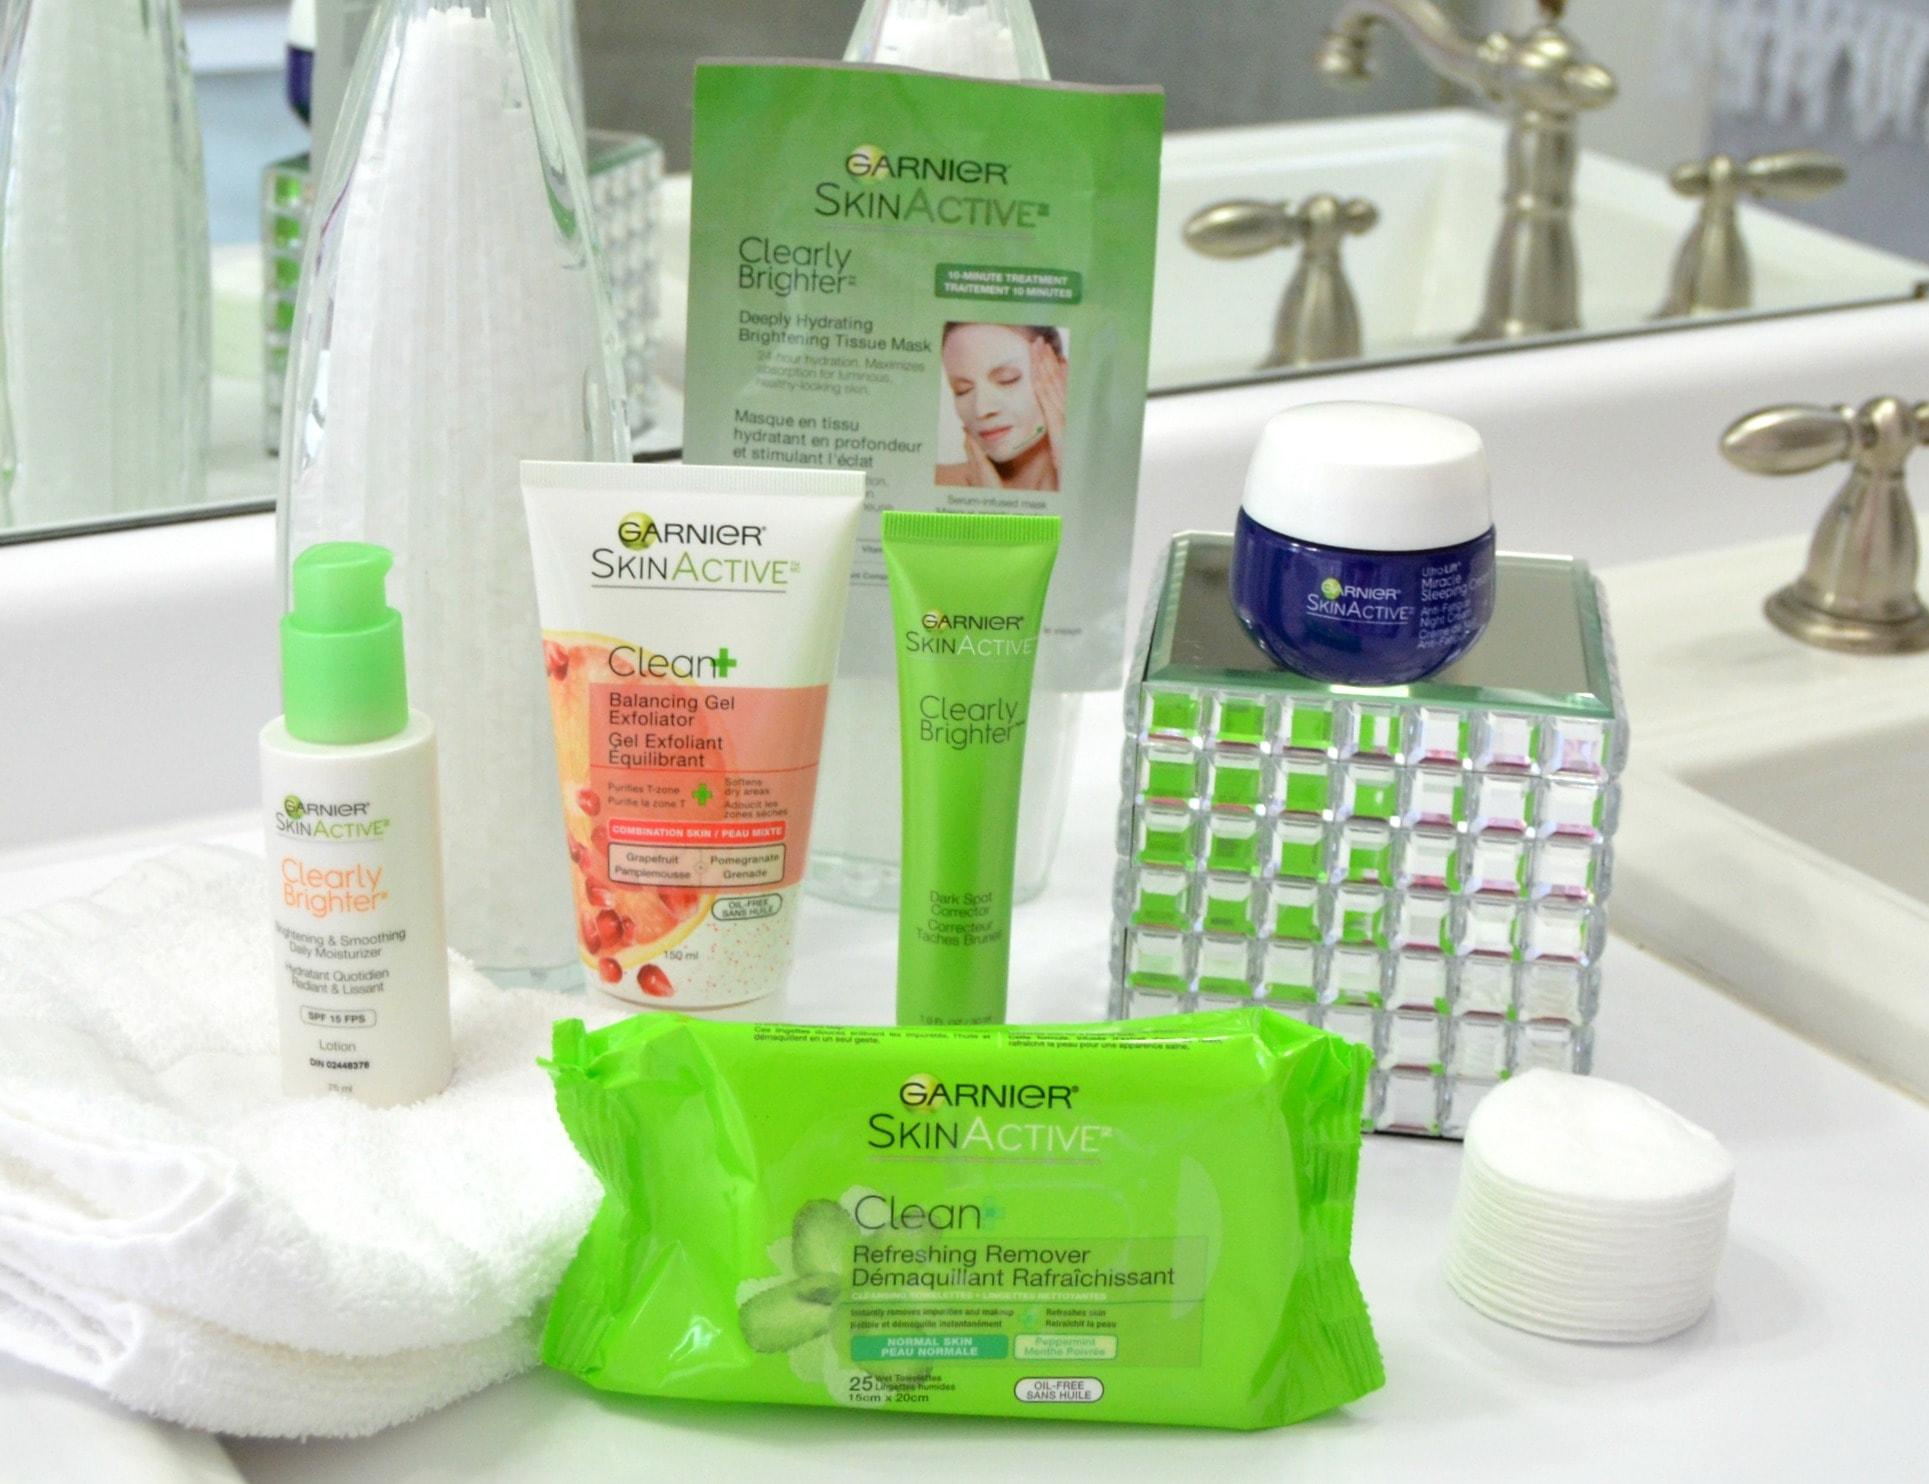 Garnier SkinActive Personalized Skincare Routine ...